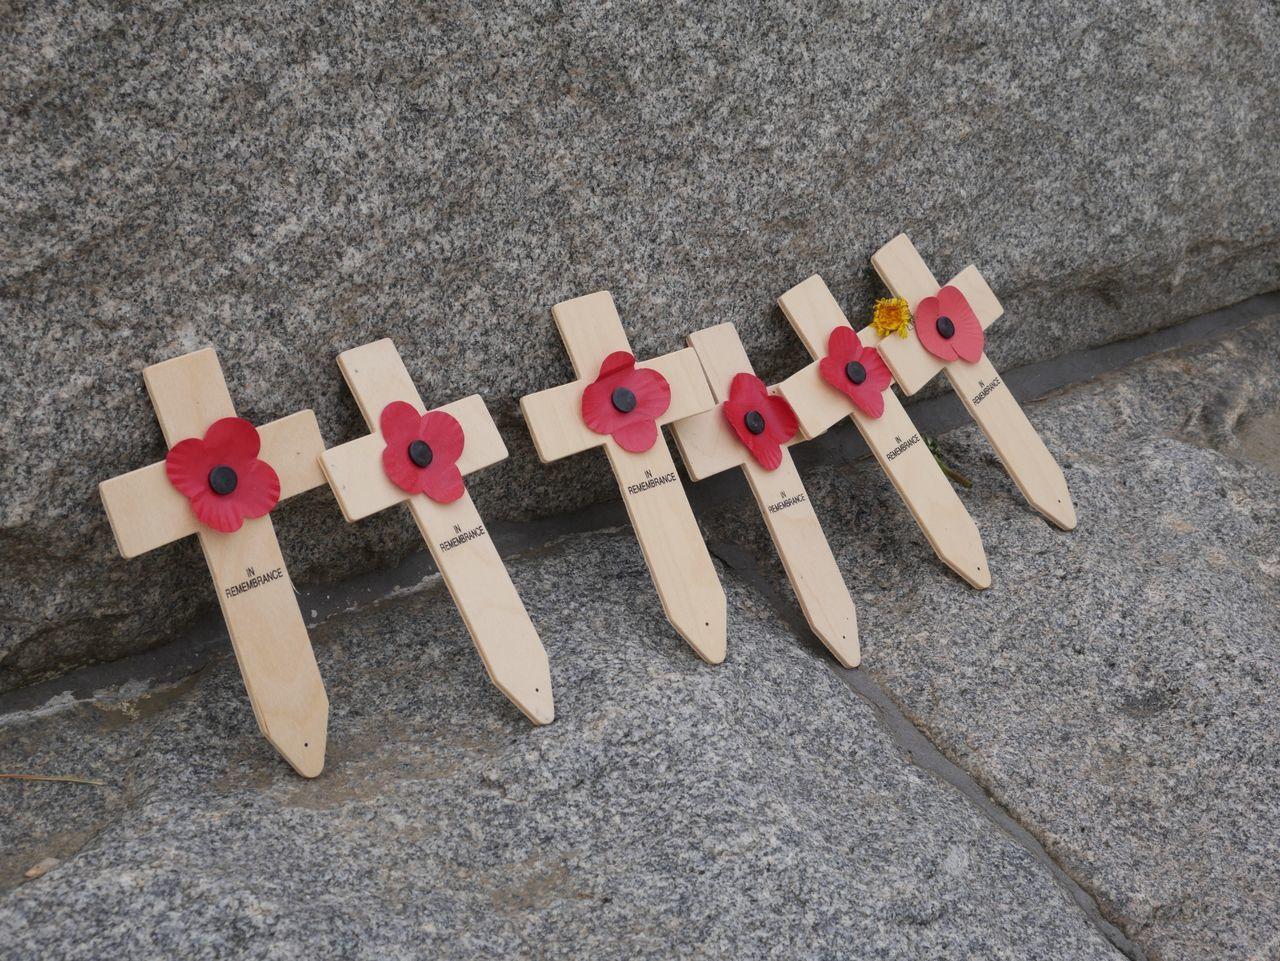 In Remembrance Poppy Poppies  Cross Rememberance Ww1